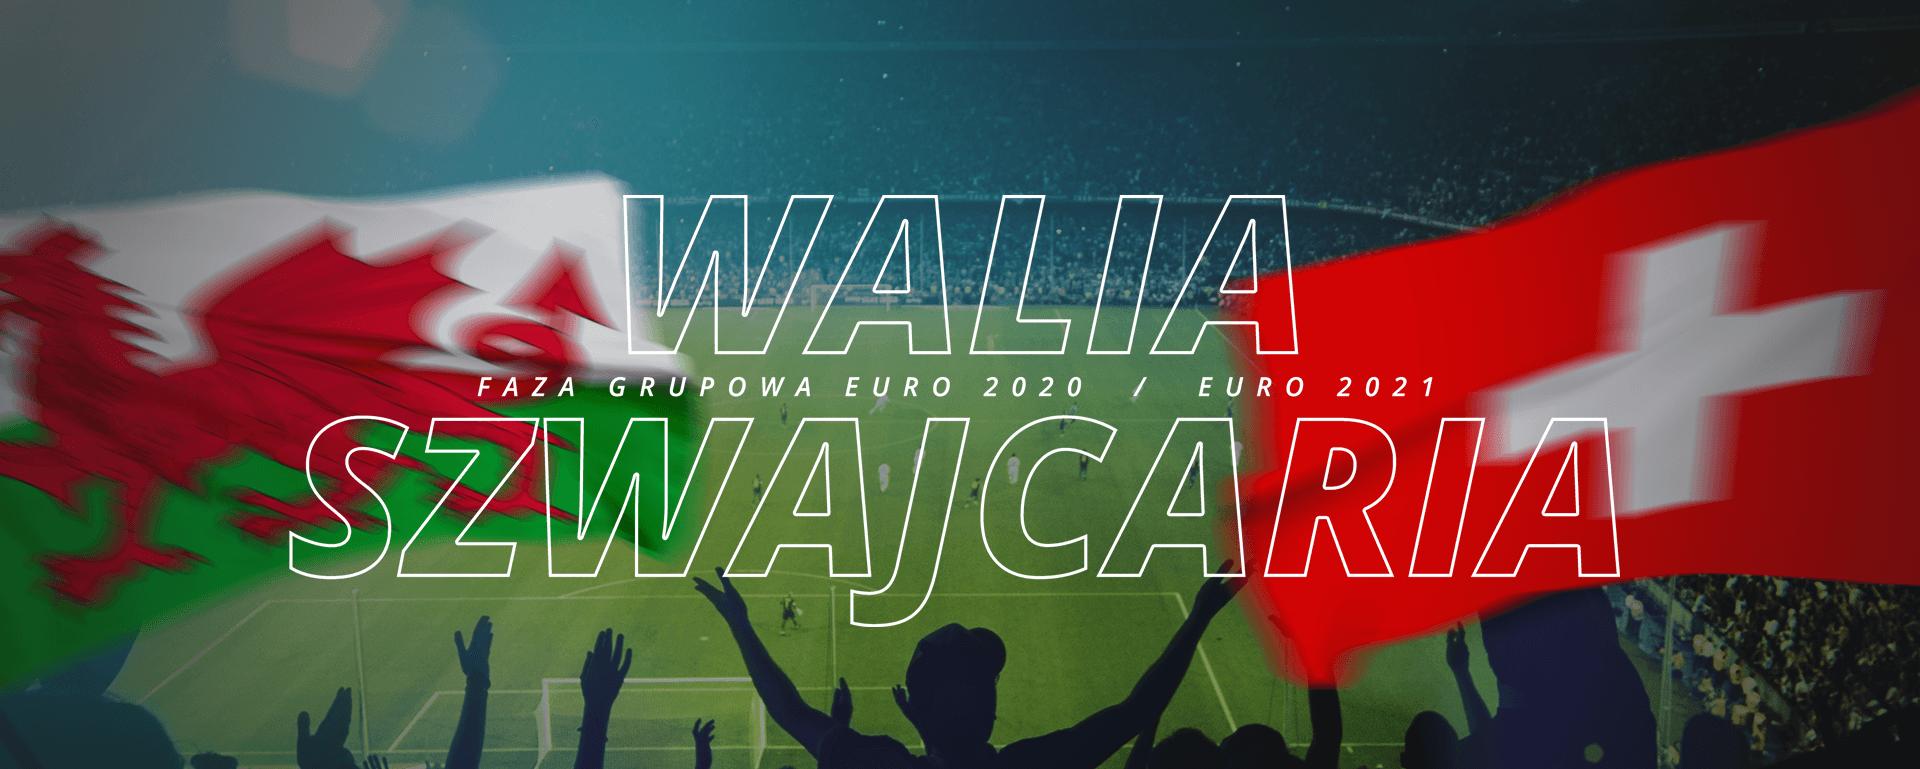 Walia – Szwajcaria | faza grupowa Euro 2020 / Euro 2021